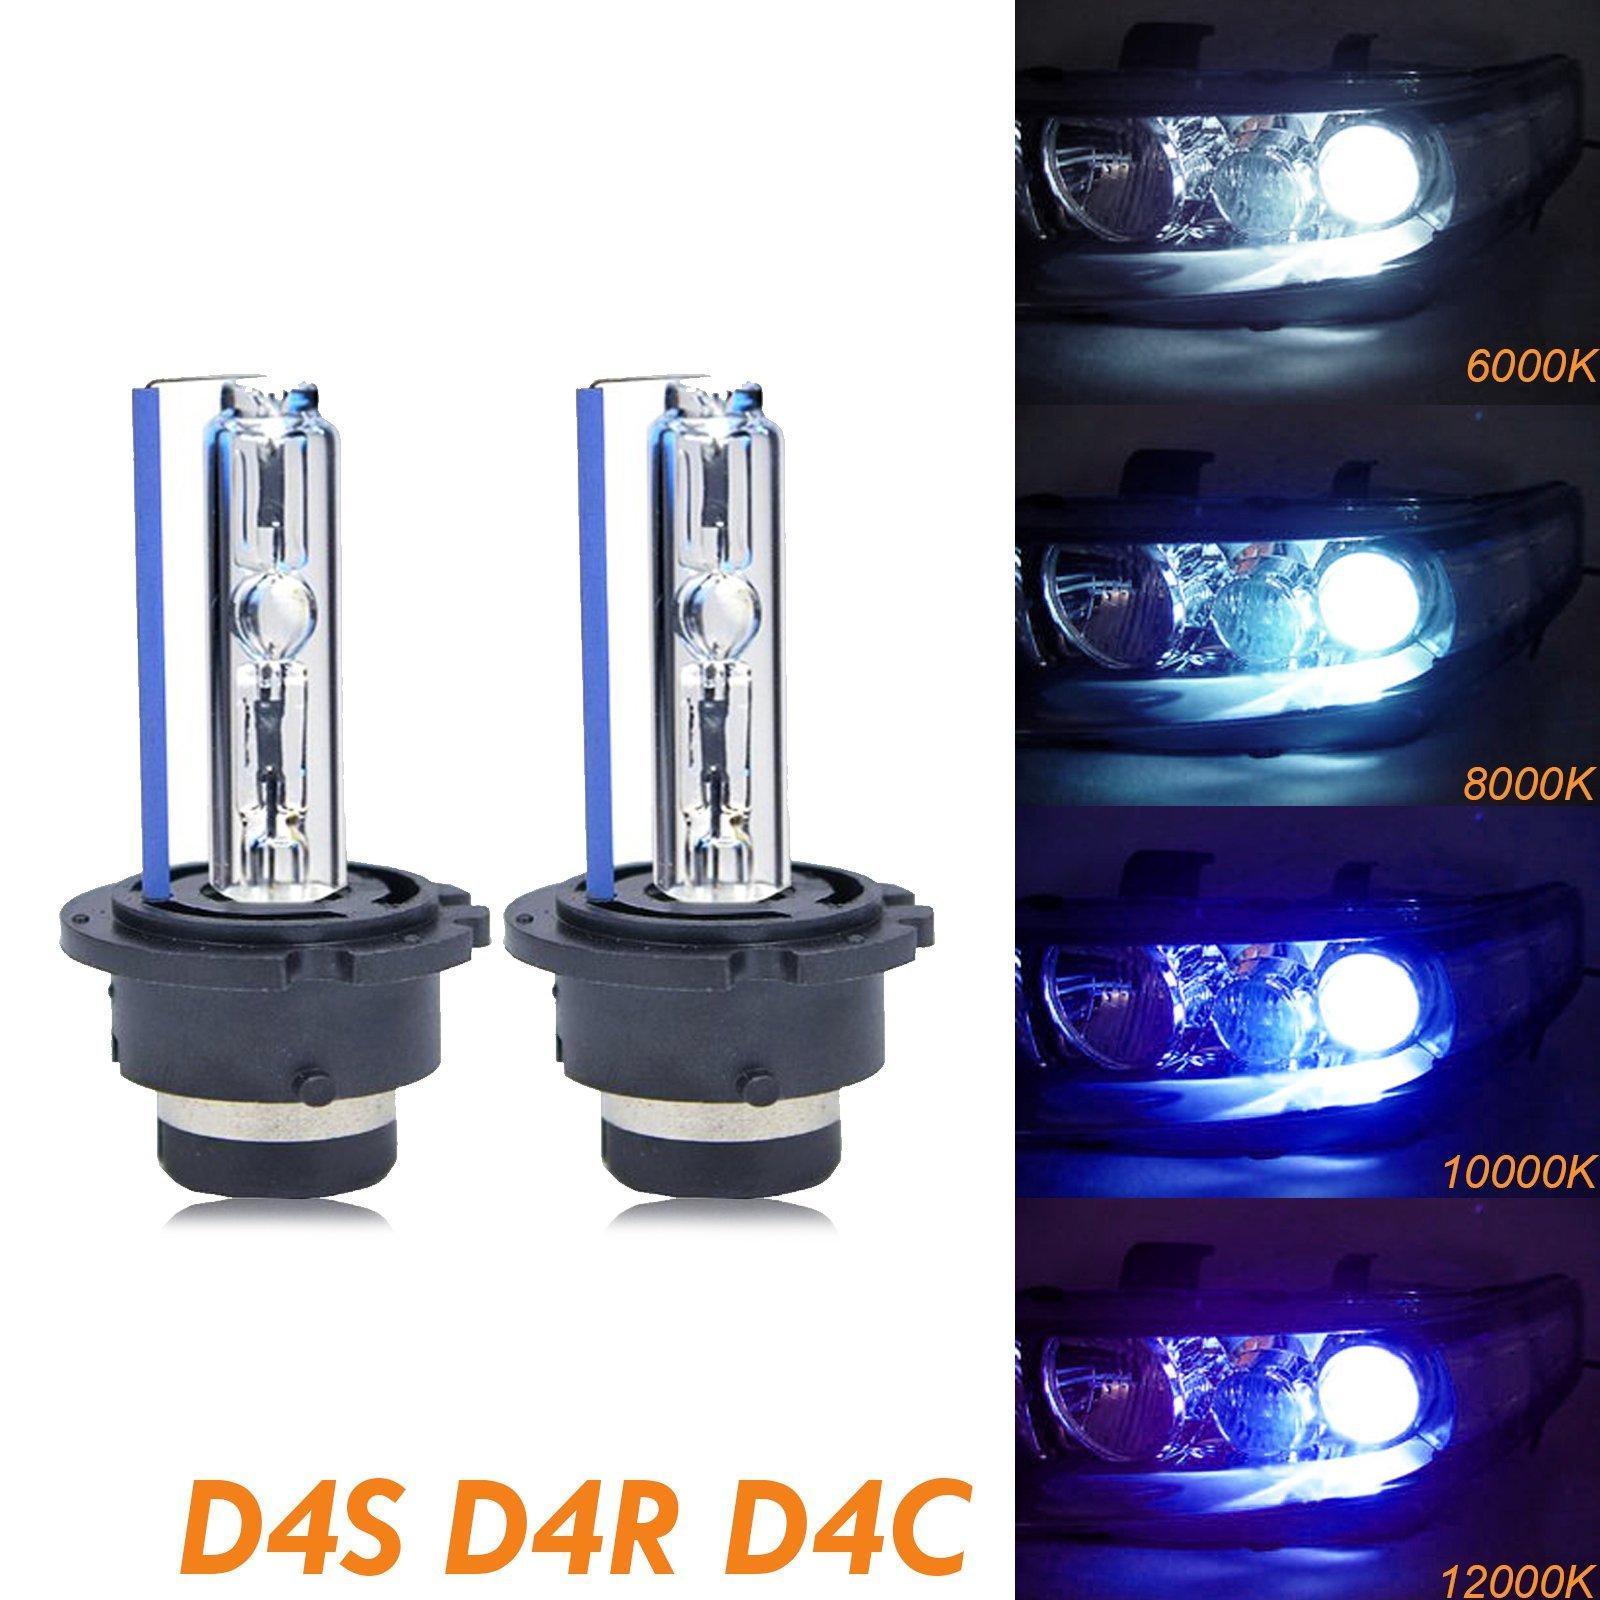 Xotic Tech D4S D4C D4R HID OEM Direct Replacement Headlight Xenon Beam Bulbs[12000K Purple]